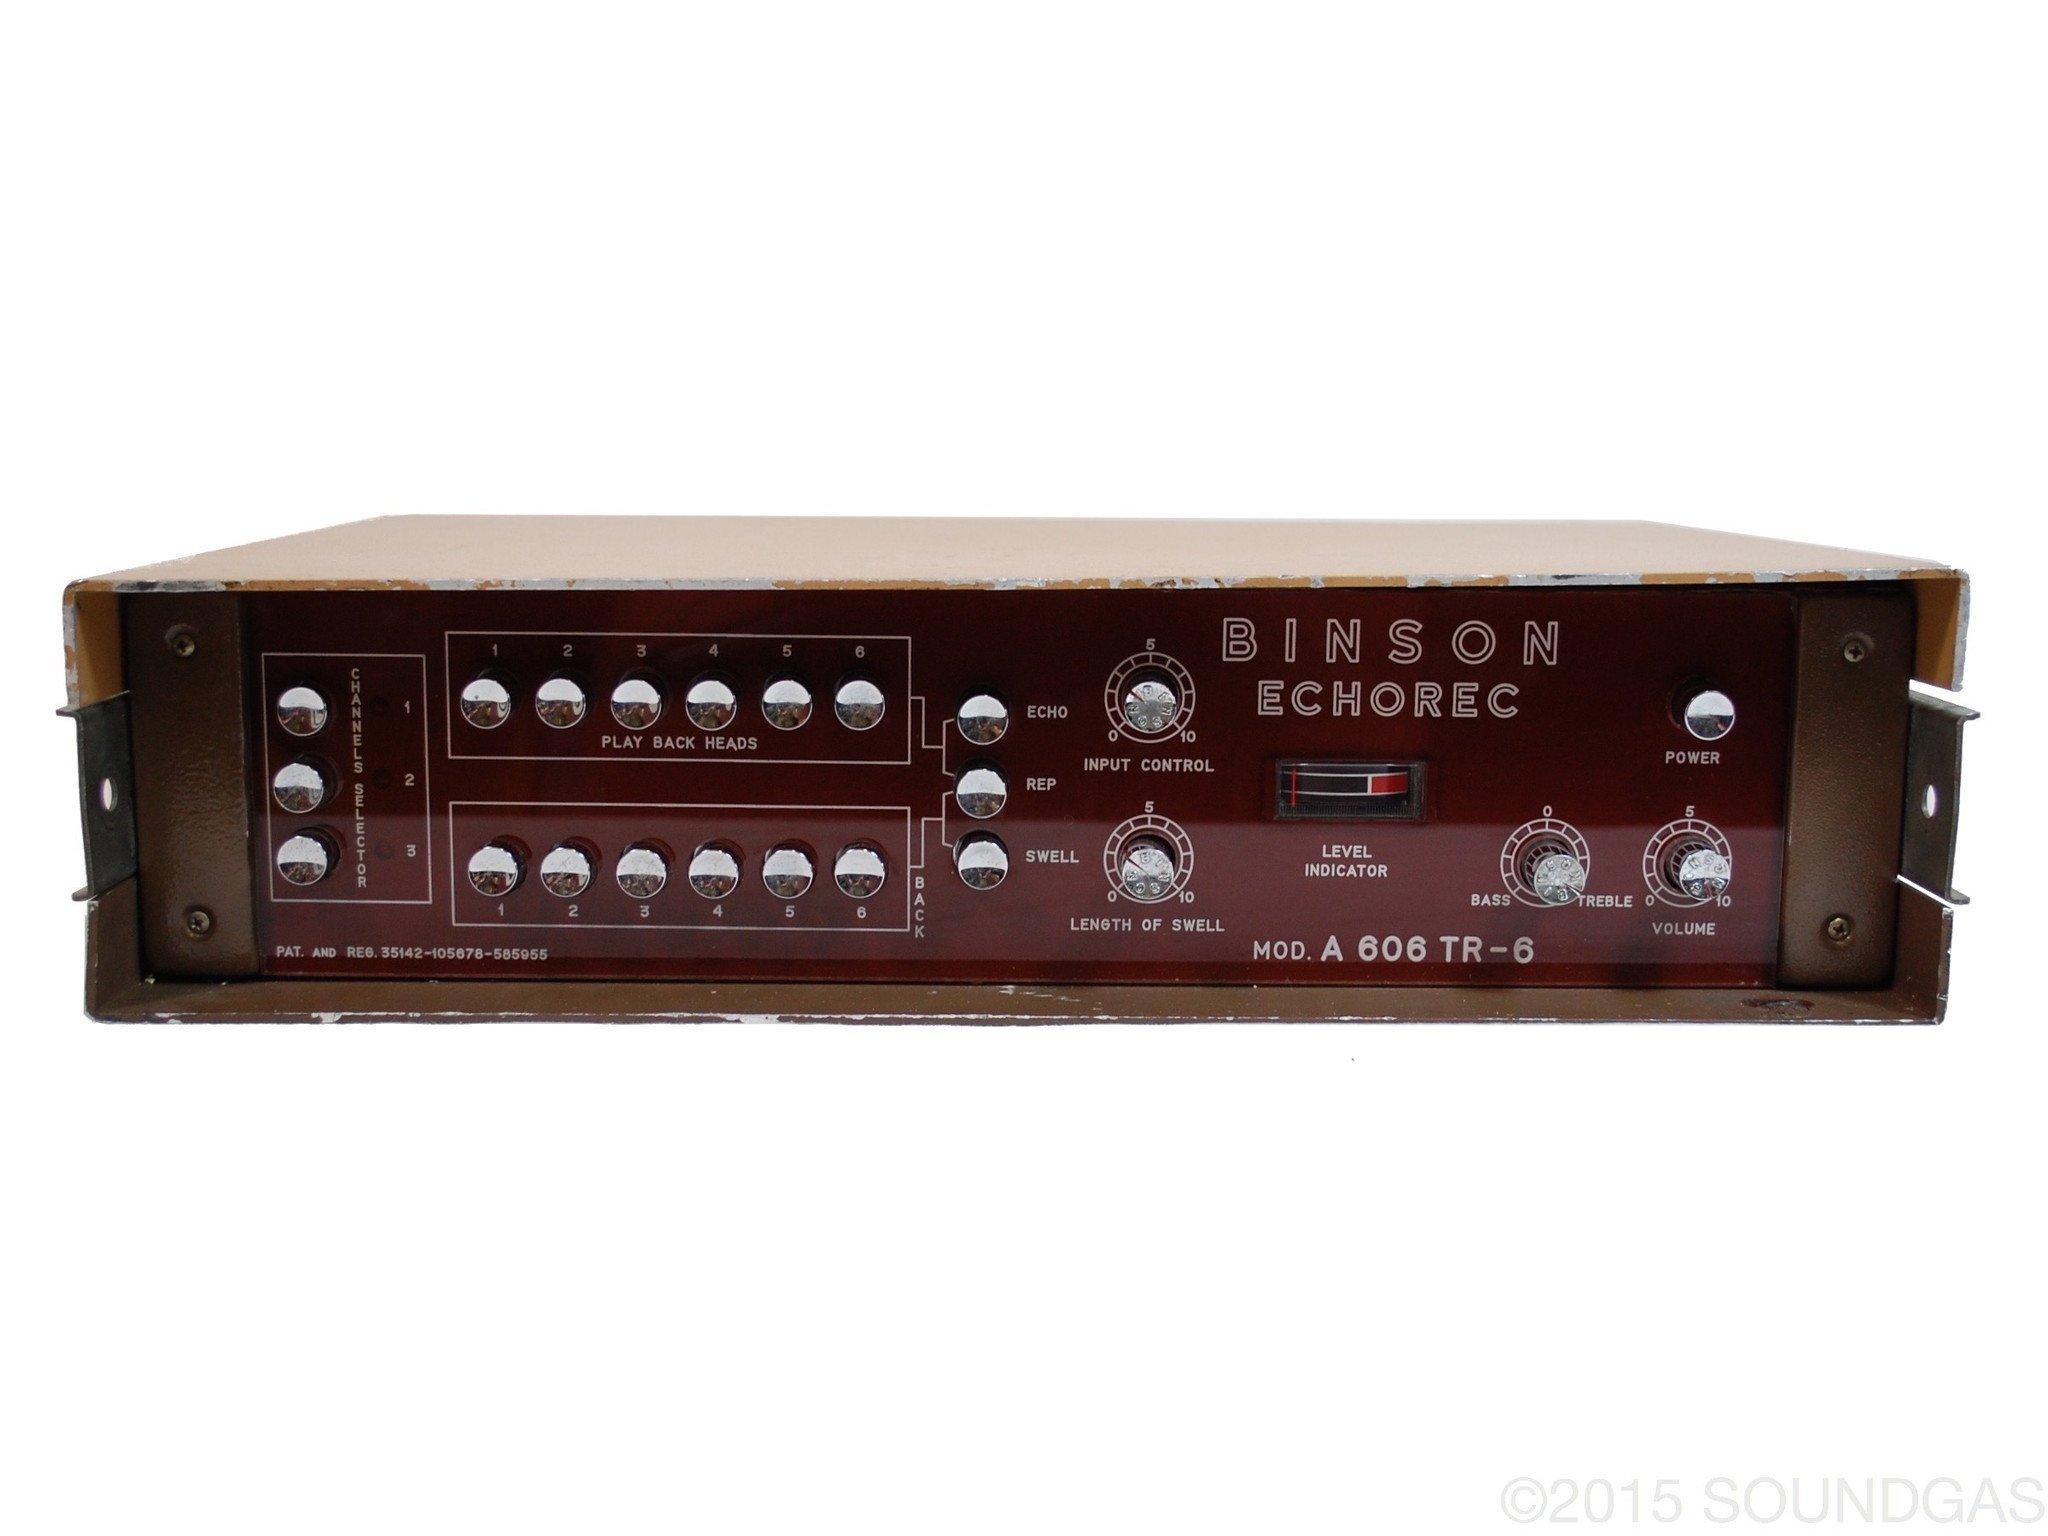 Binson-Echorec-606-TR6-Valve-Tube-Disc-Echo-Cover-1_07b6bb08-966b-4b20-ab34-d33b2288744f